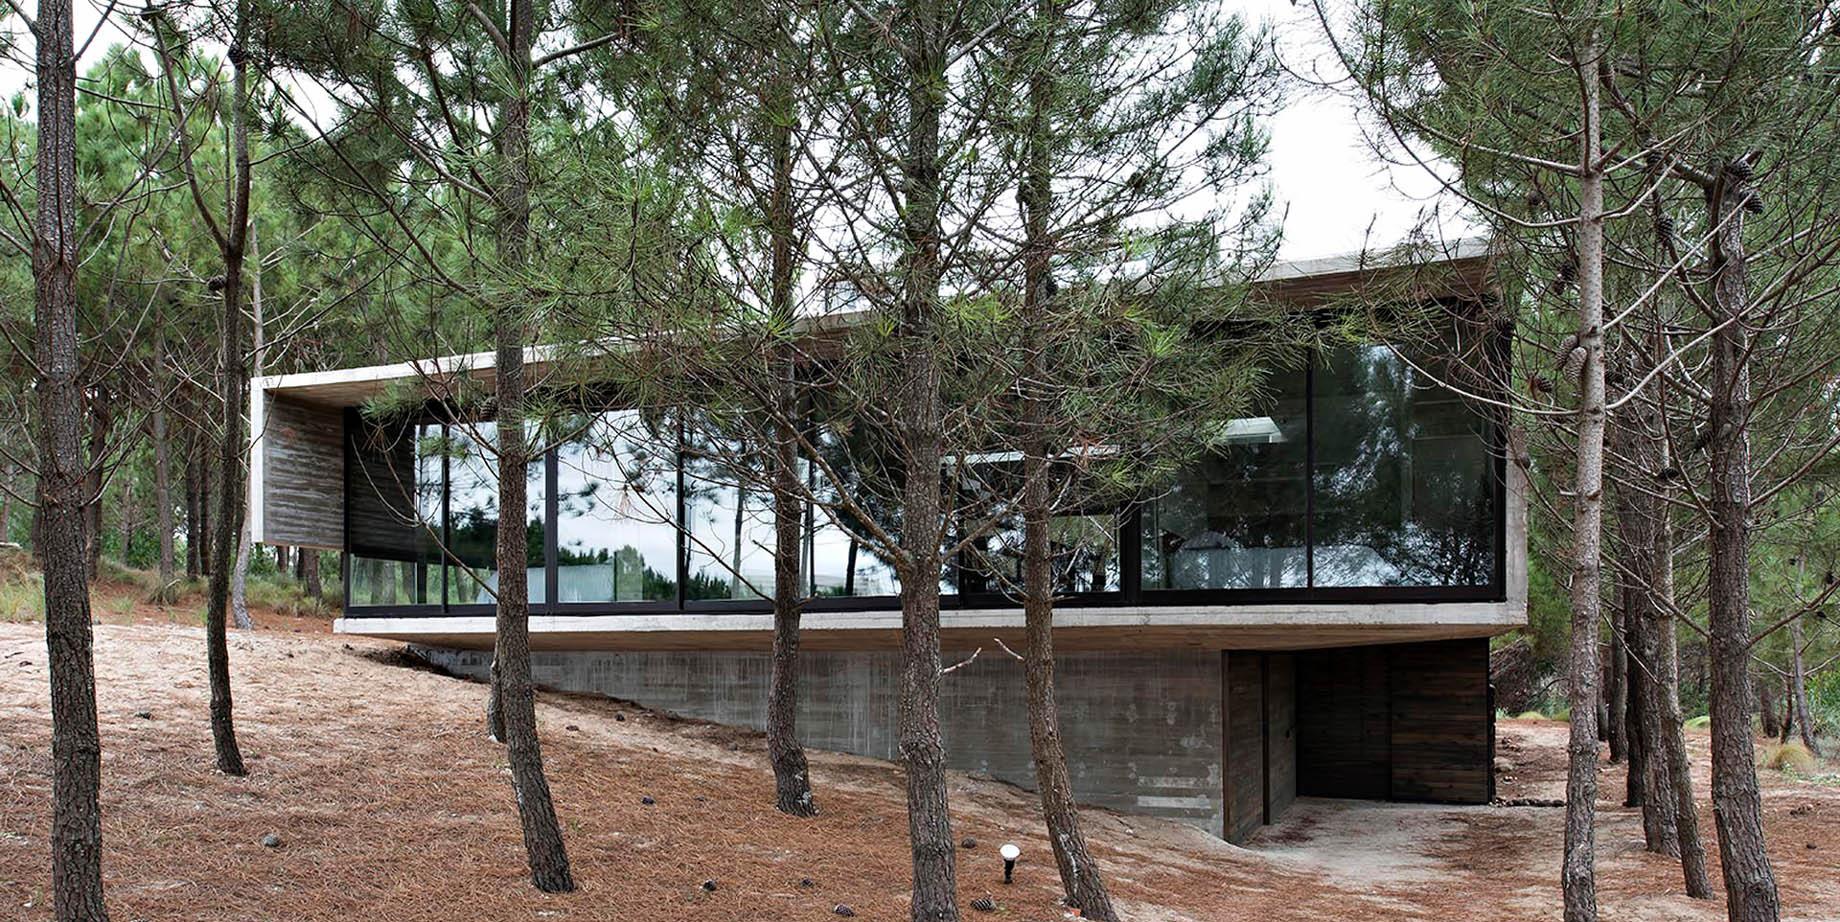 L4 House – Costa Esmeralda, Buenos Aires, Argentina